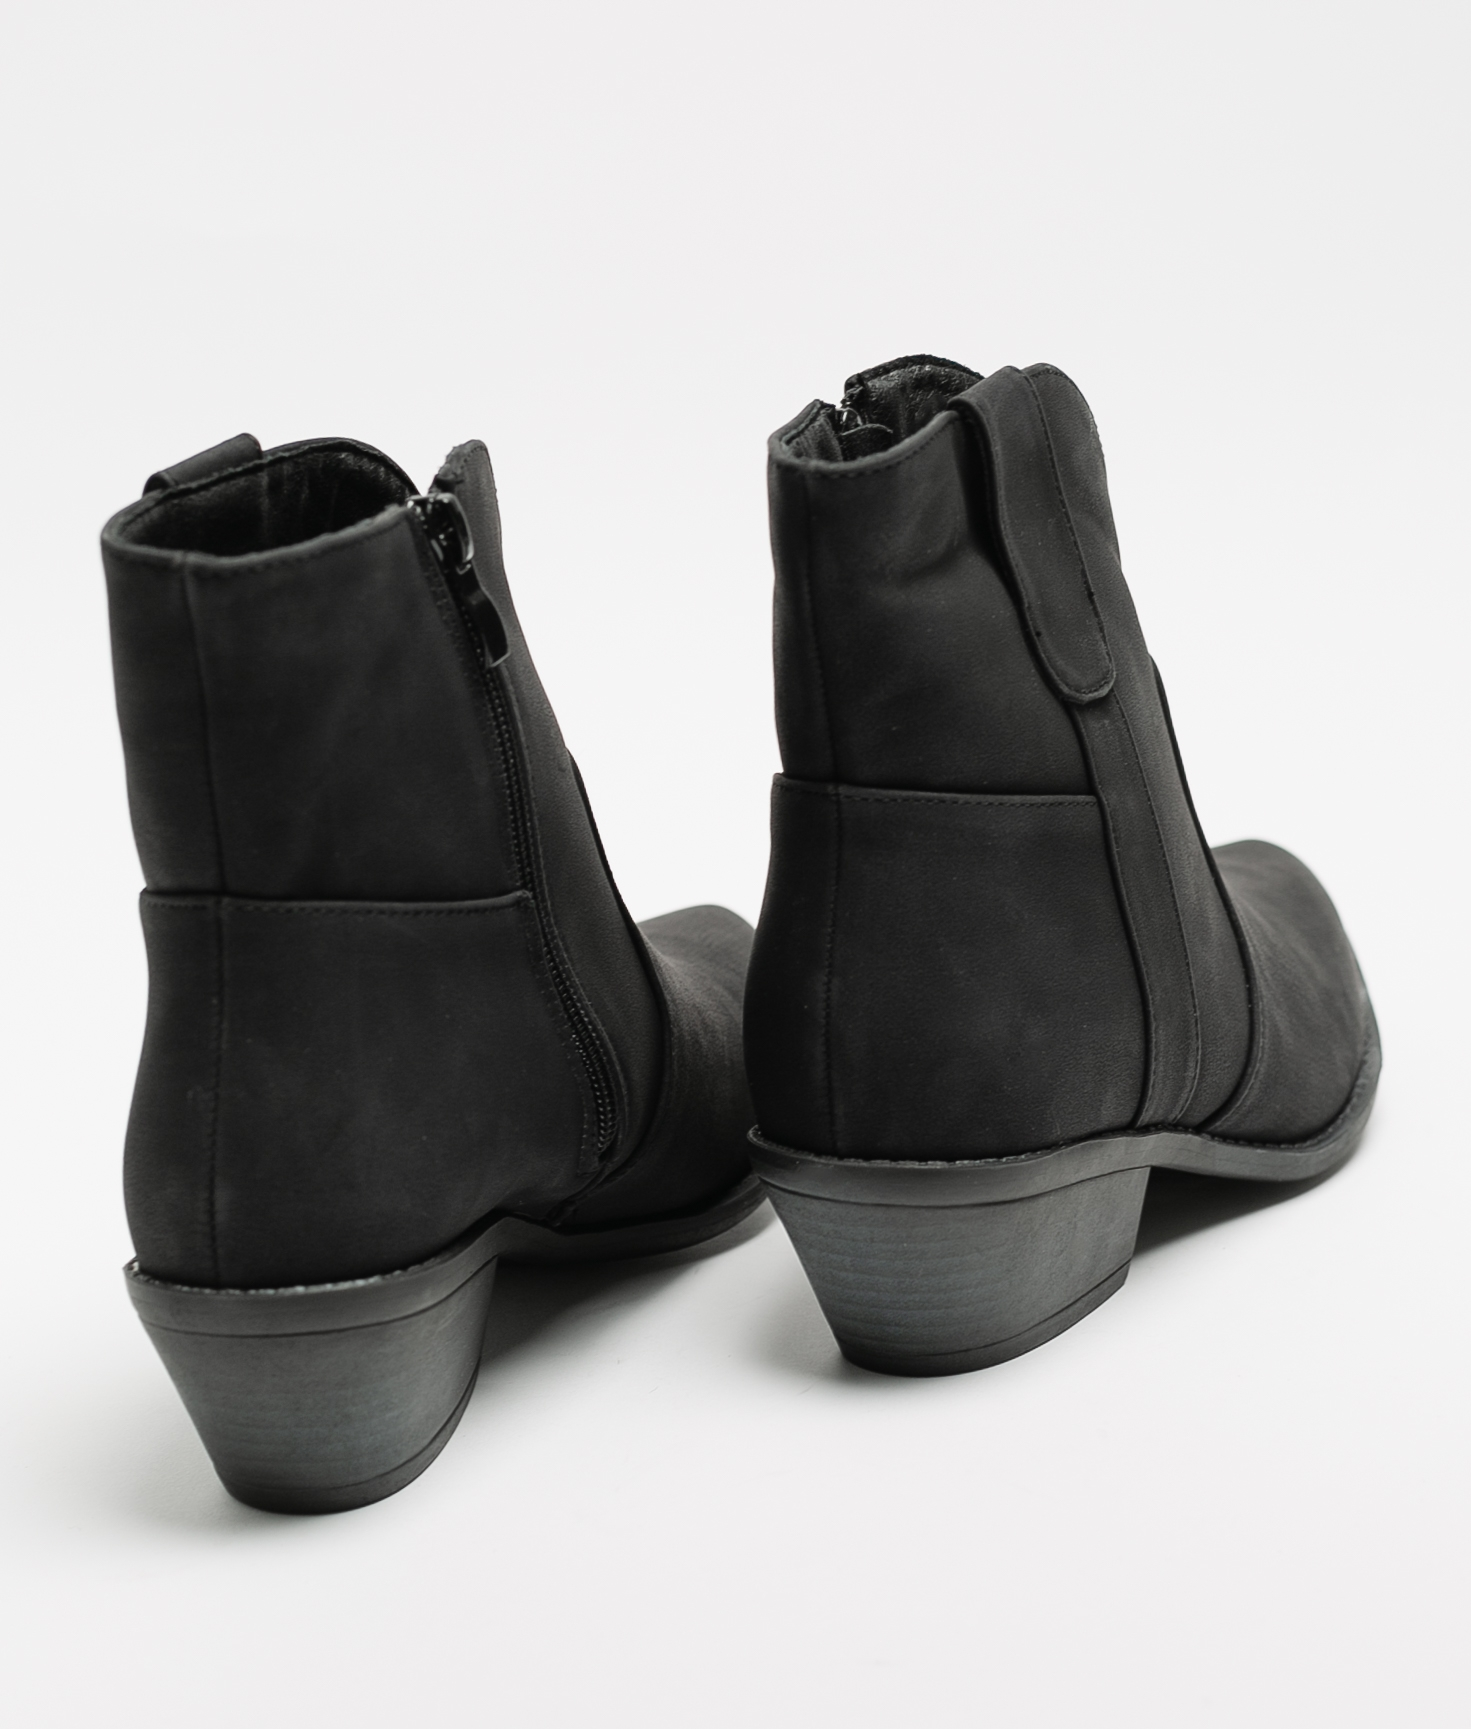 Noli Low Boot - Black